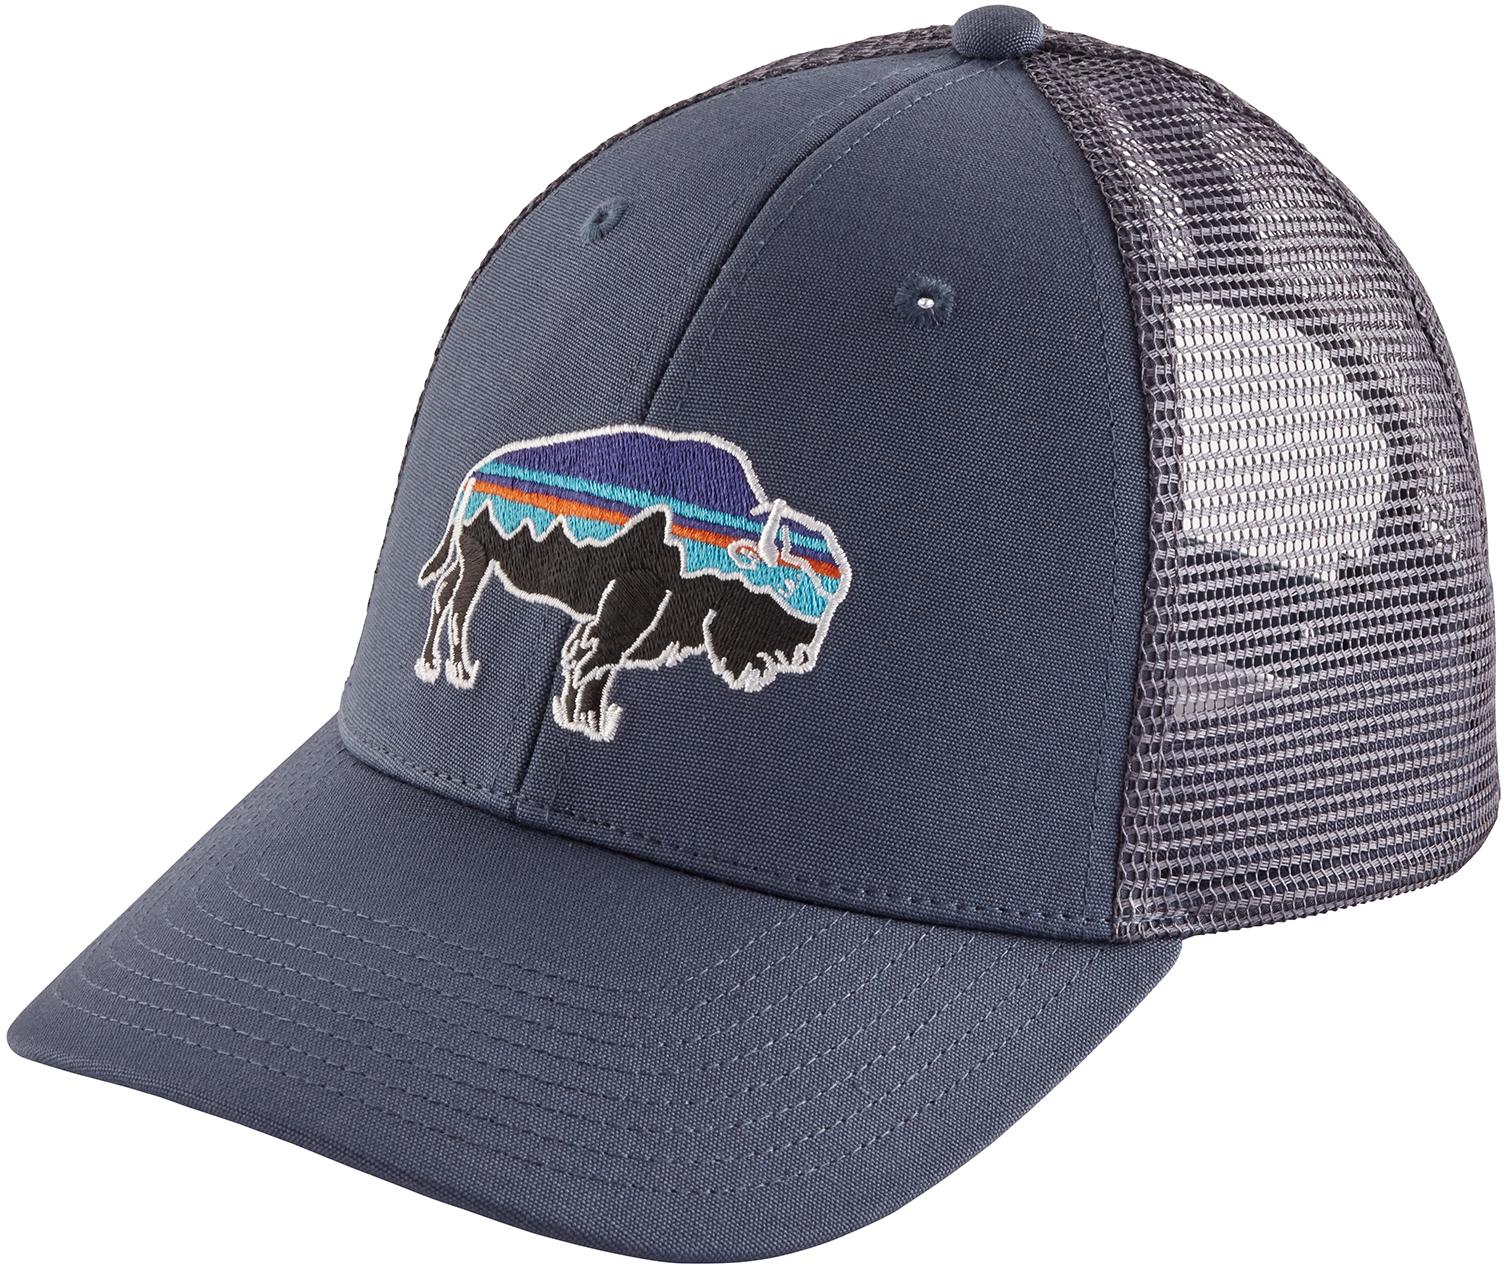 c86b2663 Patagonia Fitz Roy Bison LoPro Trucker Hat - Unisex | MEC